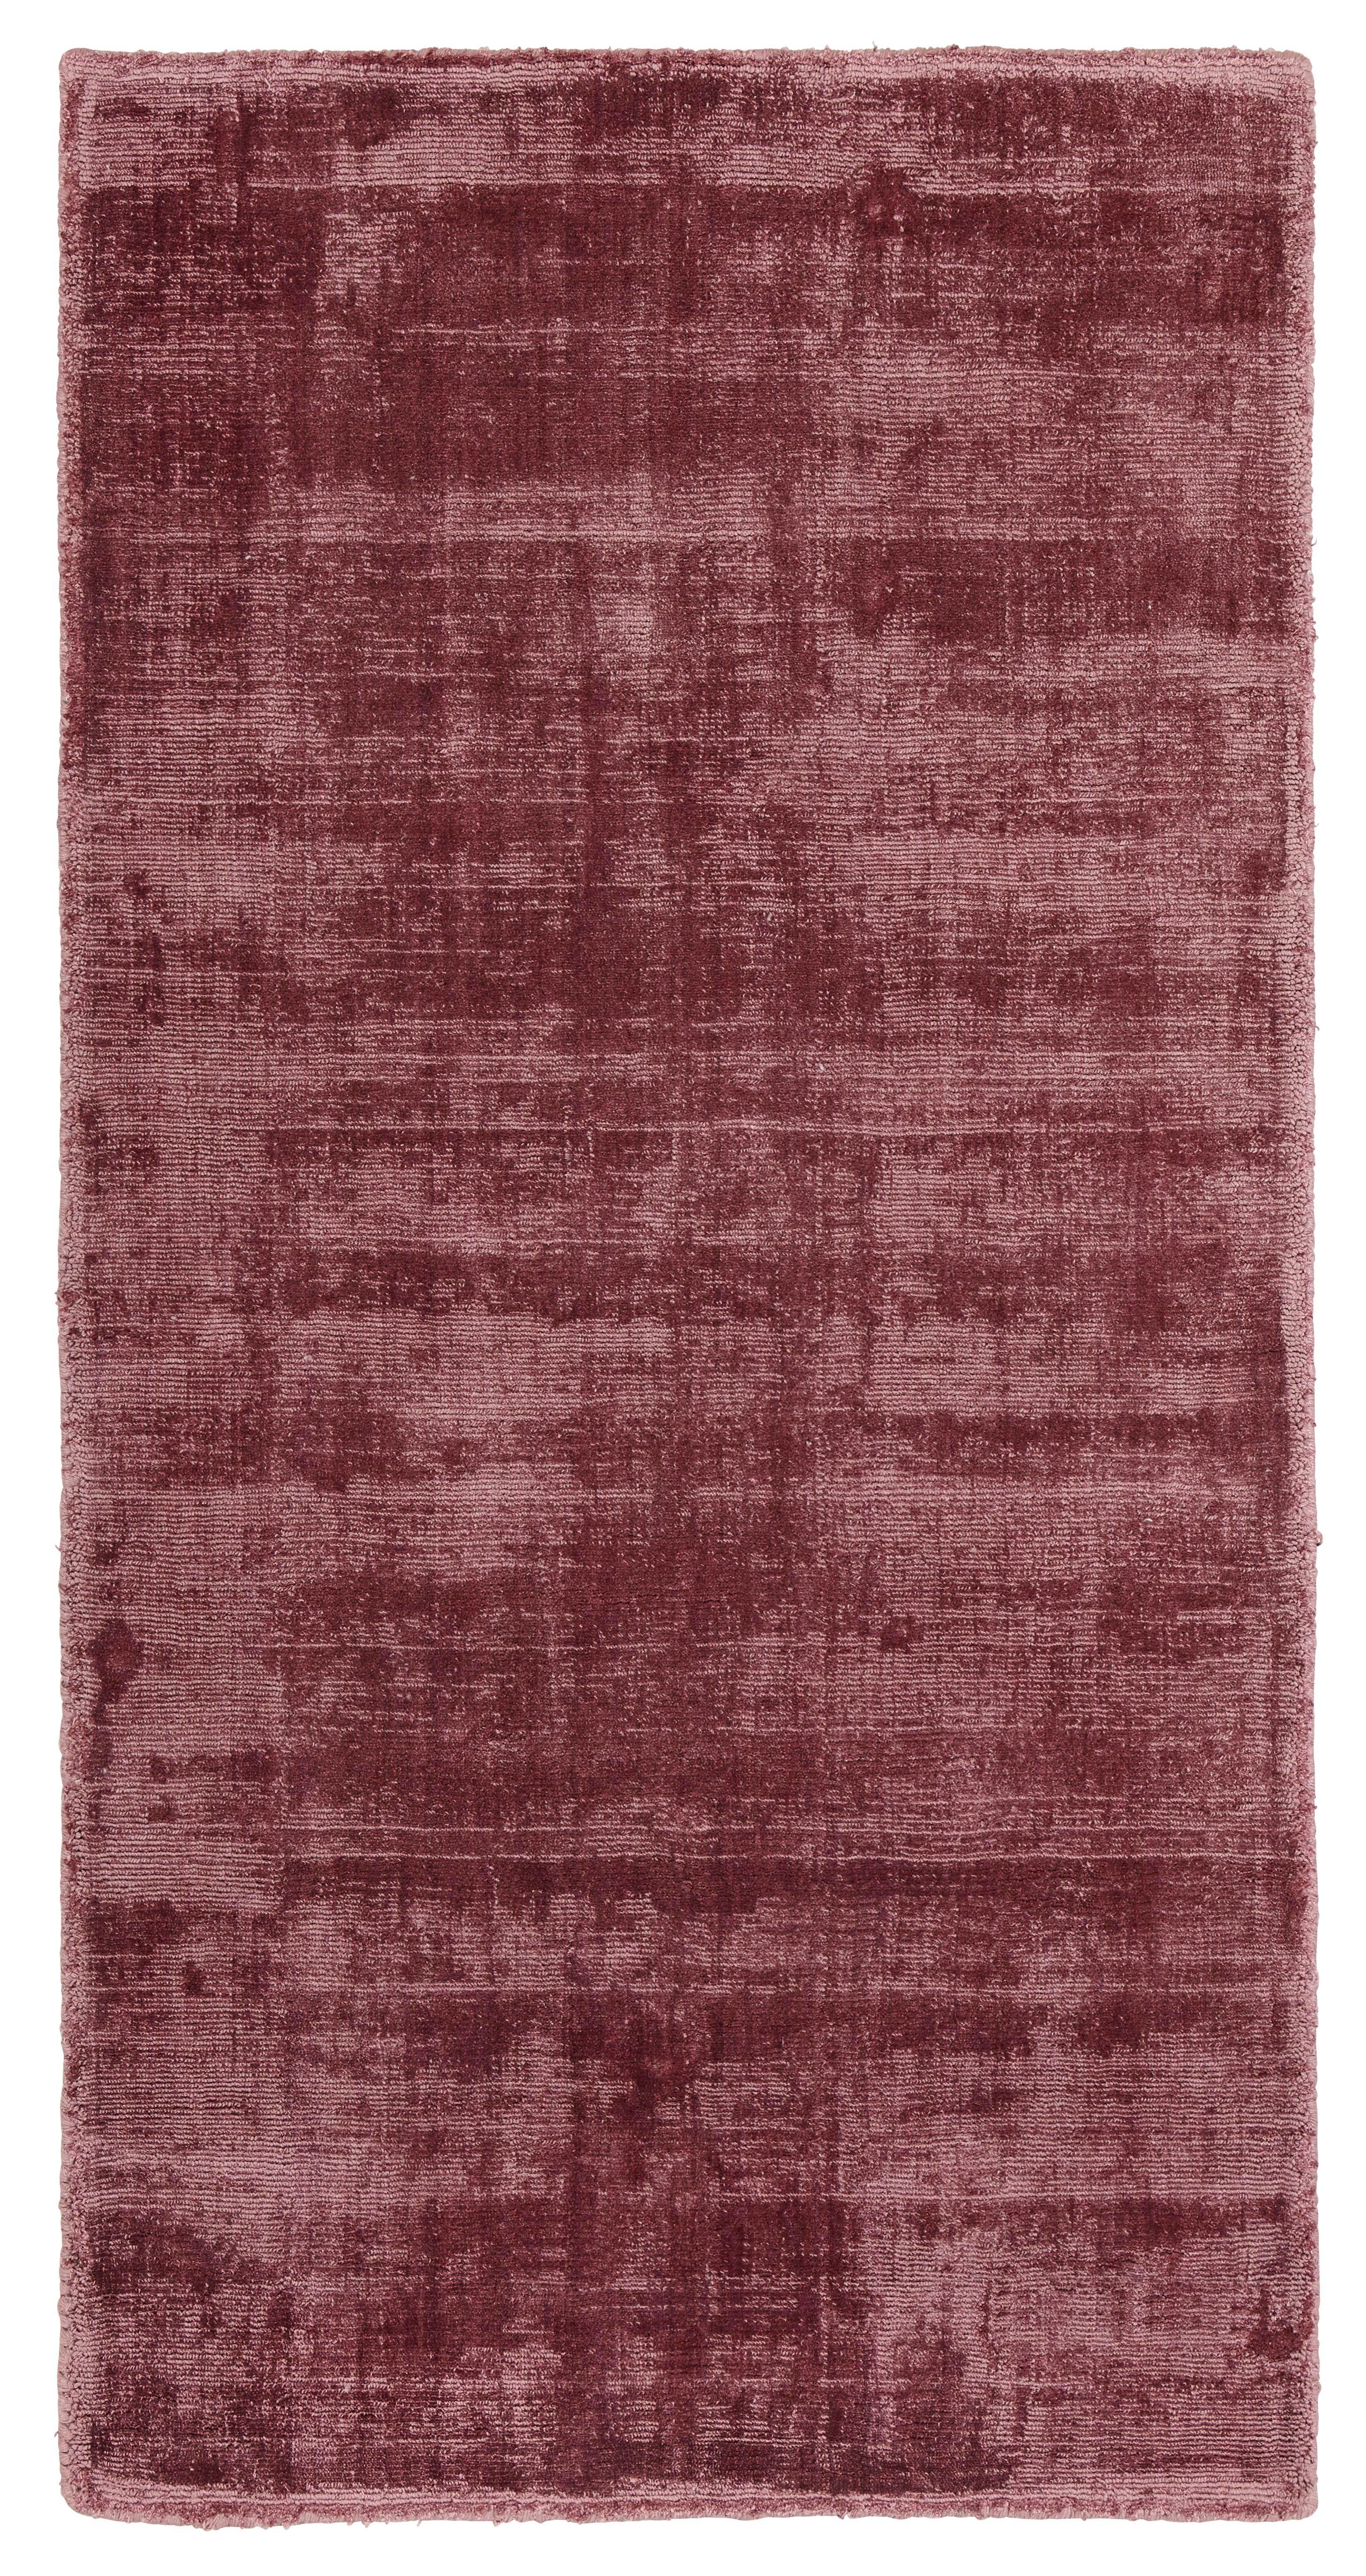 Webteppich Andrea in Flieder ca.120x170cm - Flieder, Textil (120/170cm) - MÖMAX modern living